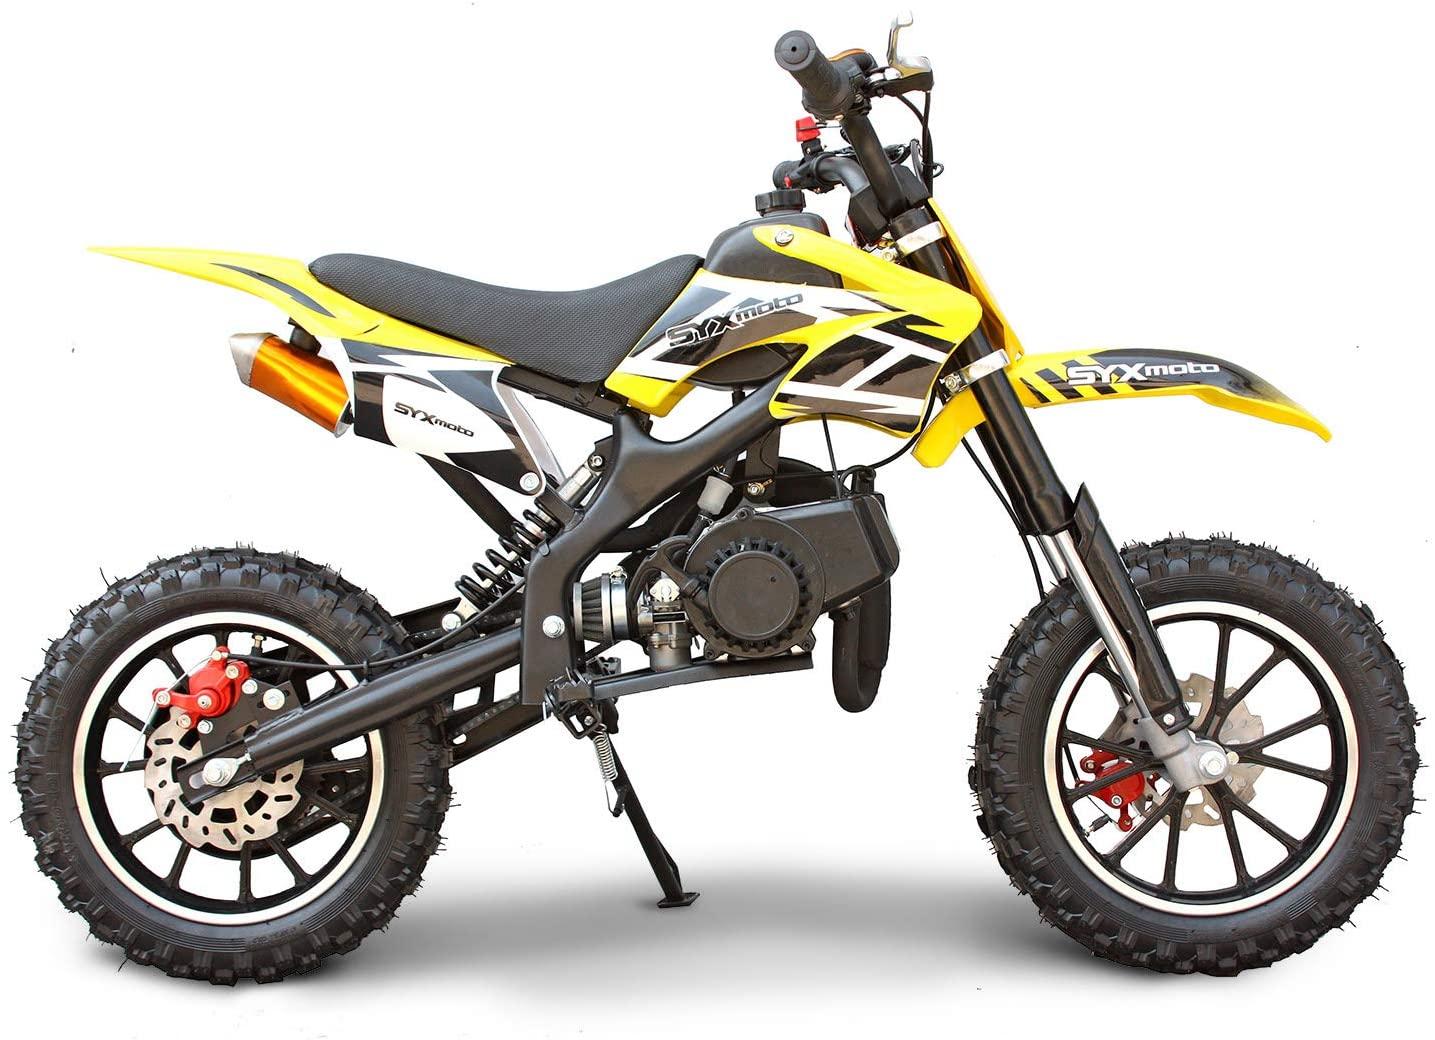 SYX MOTO Kids Dirt Bike Holeshot 50cc Gas Power Mini Dirt Bike Pit Bike Fully Automatic Transmission